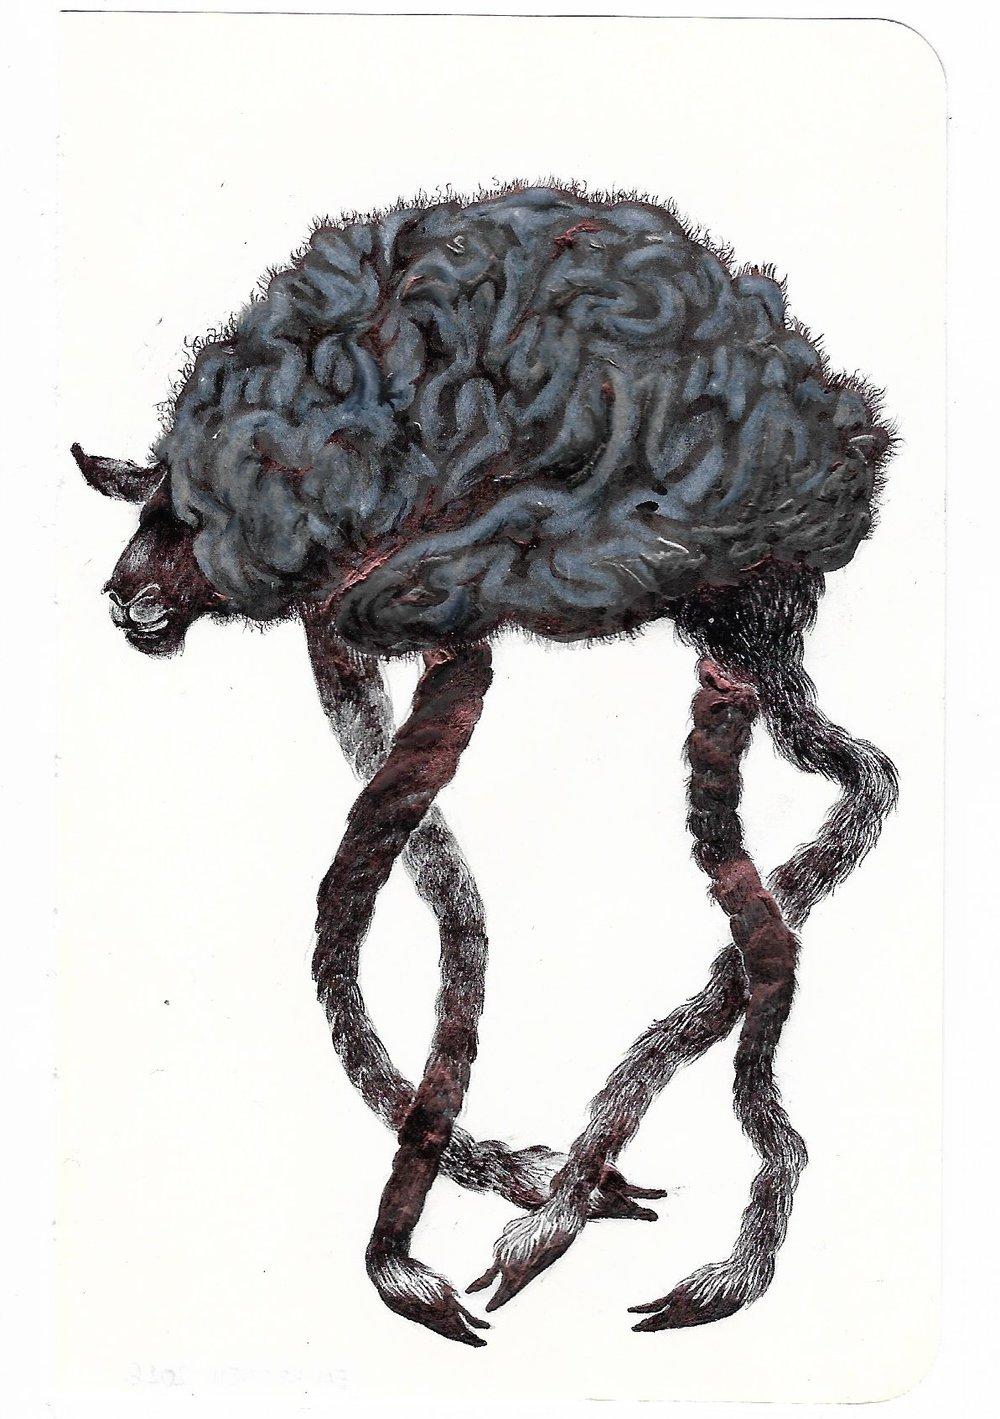 SheepBrains-2.jpg